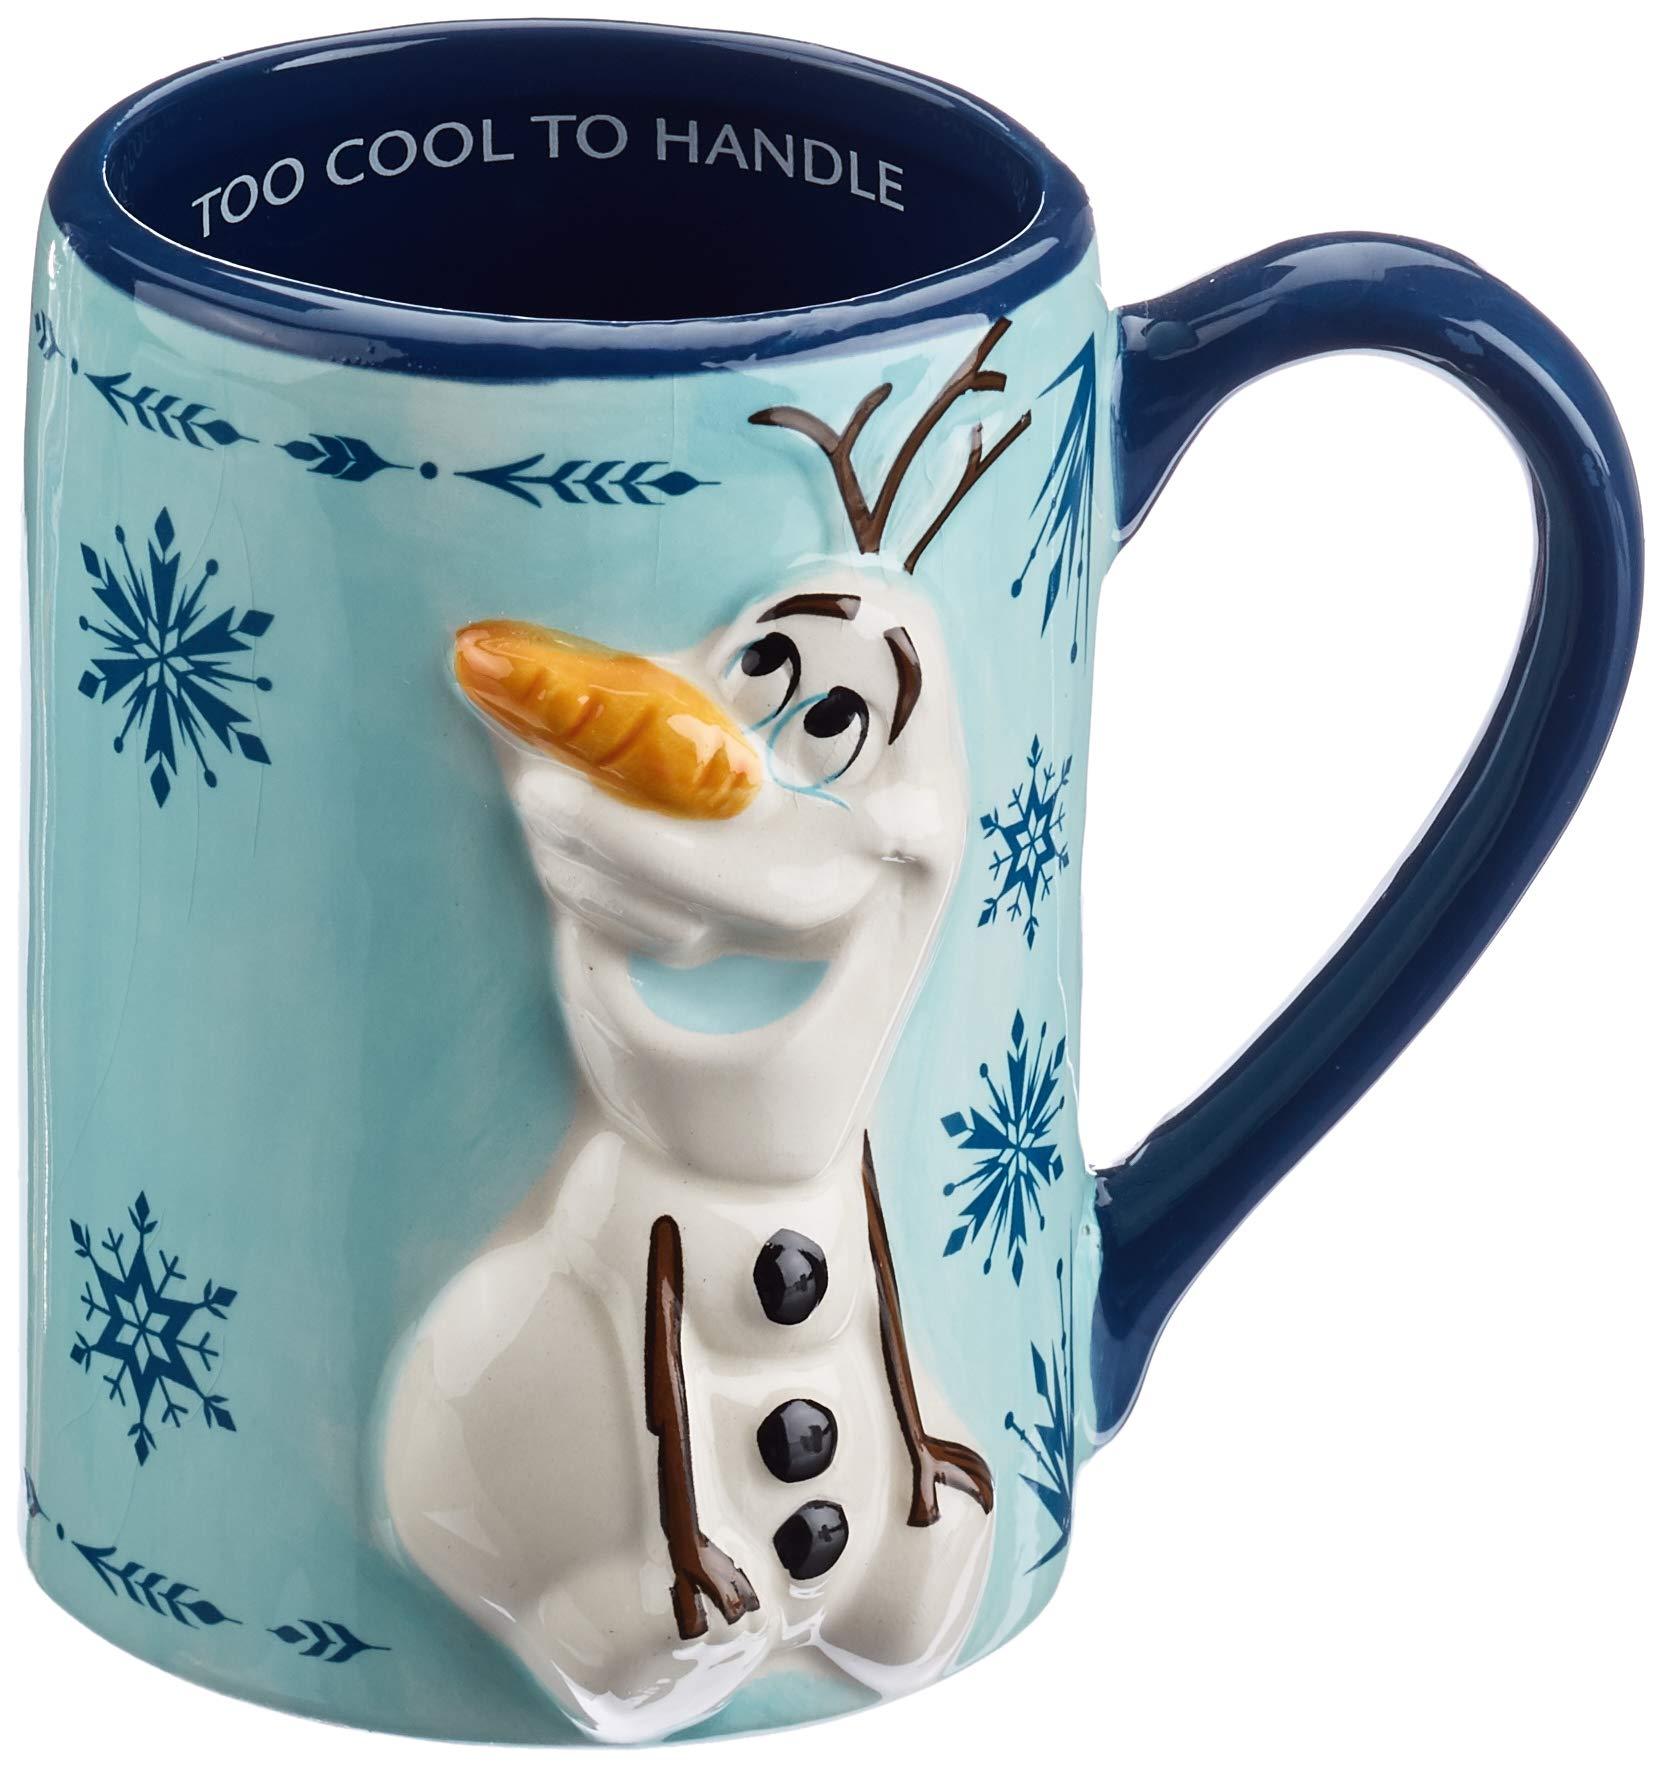 Disney SCMG25485 Sculpted Mug, Ceramic